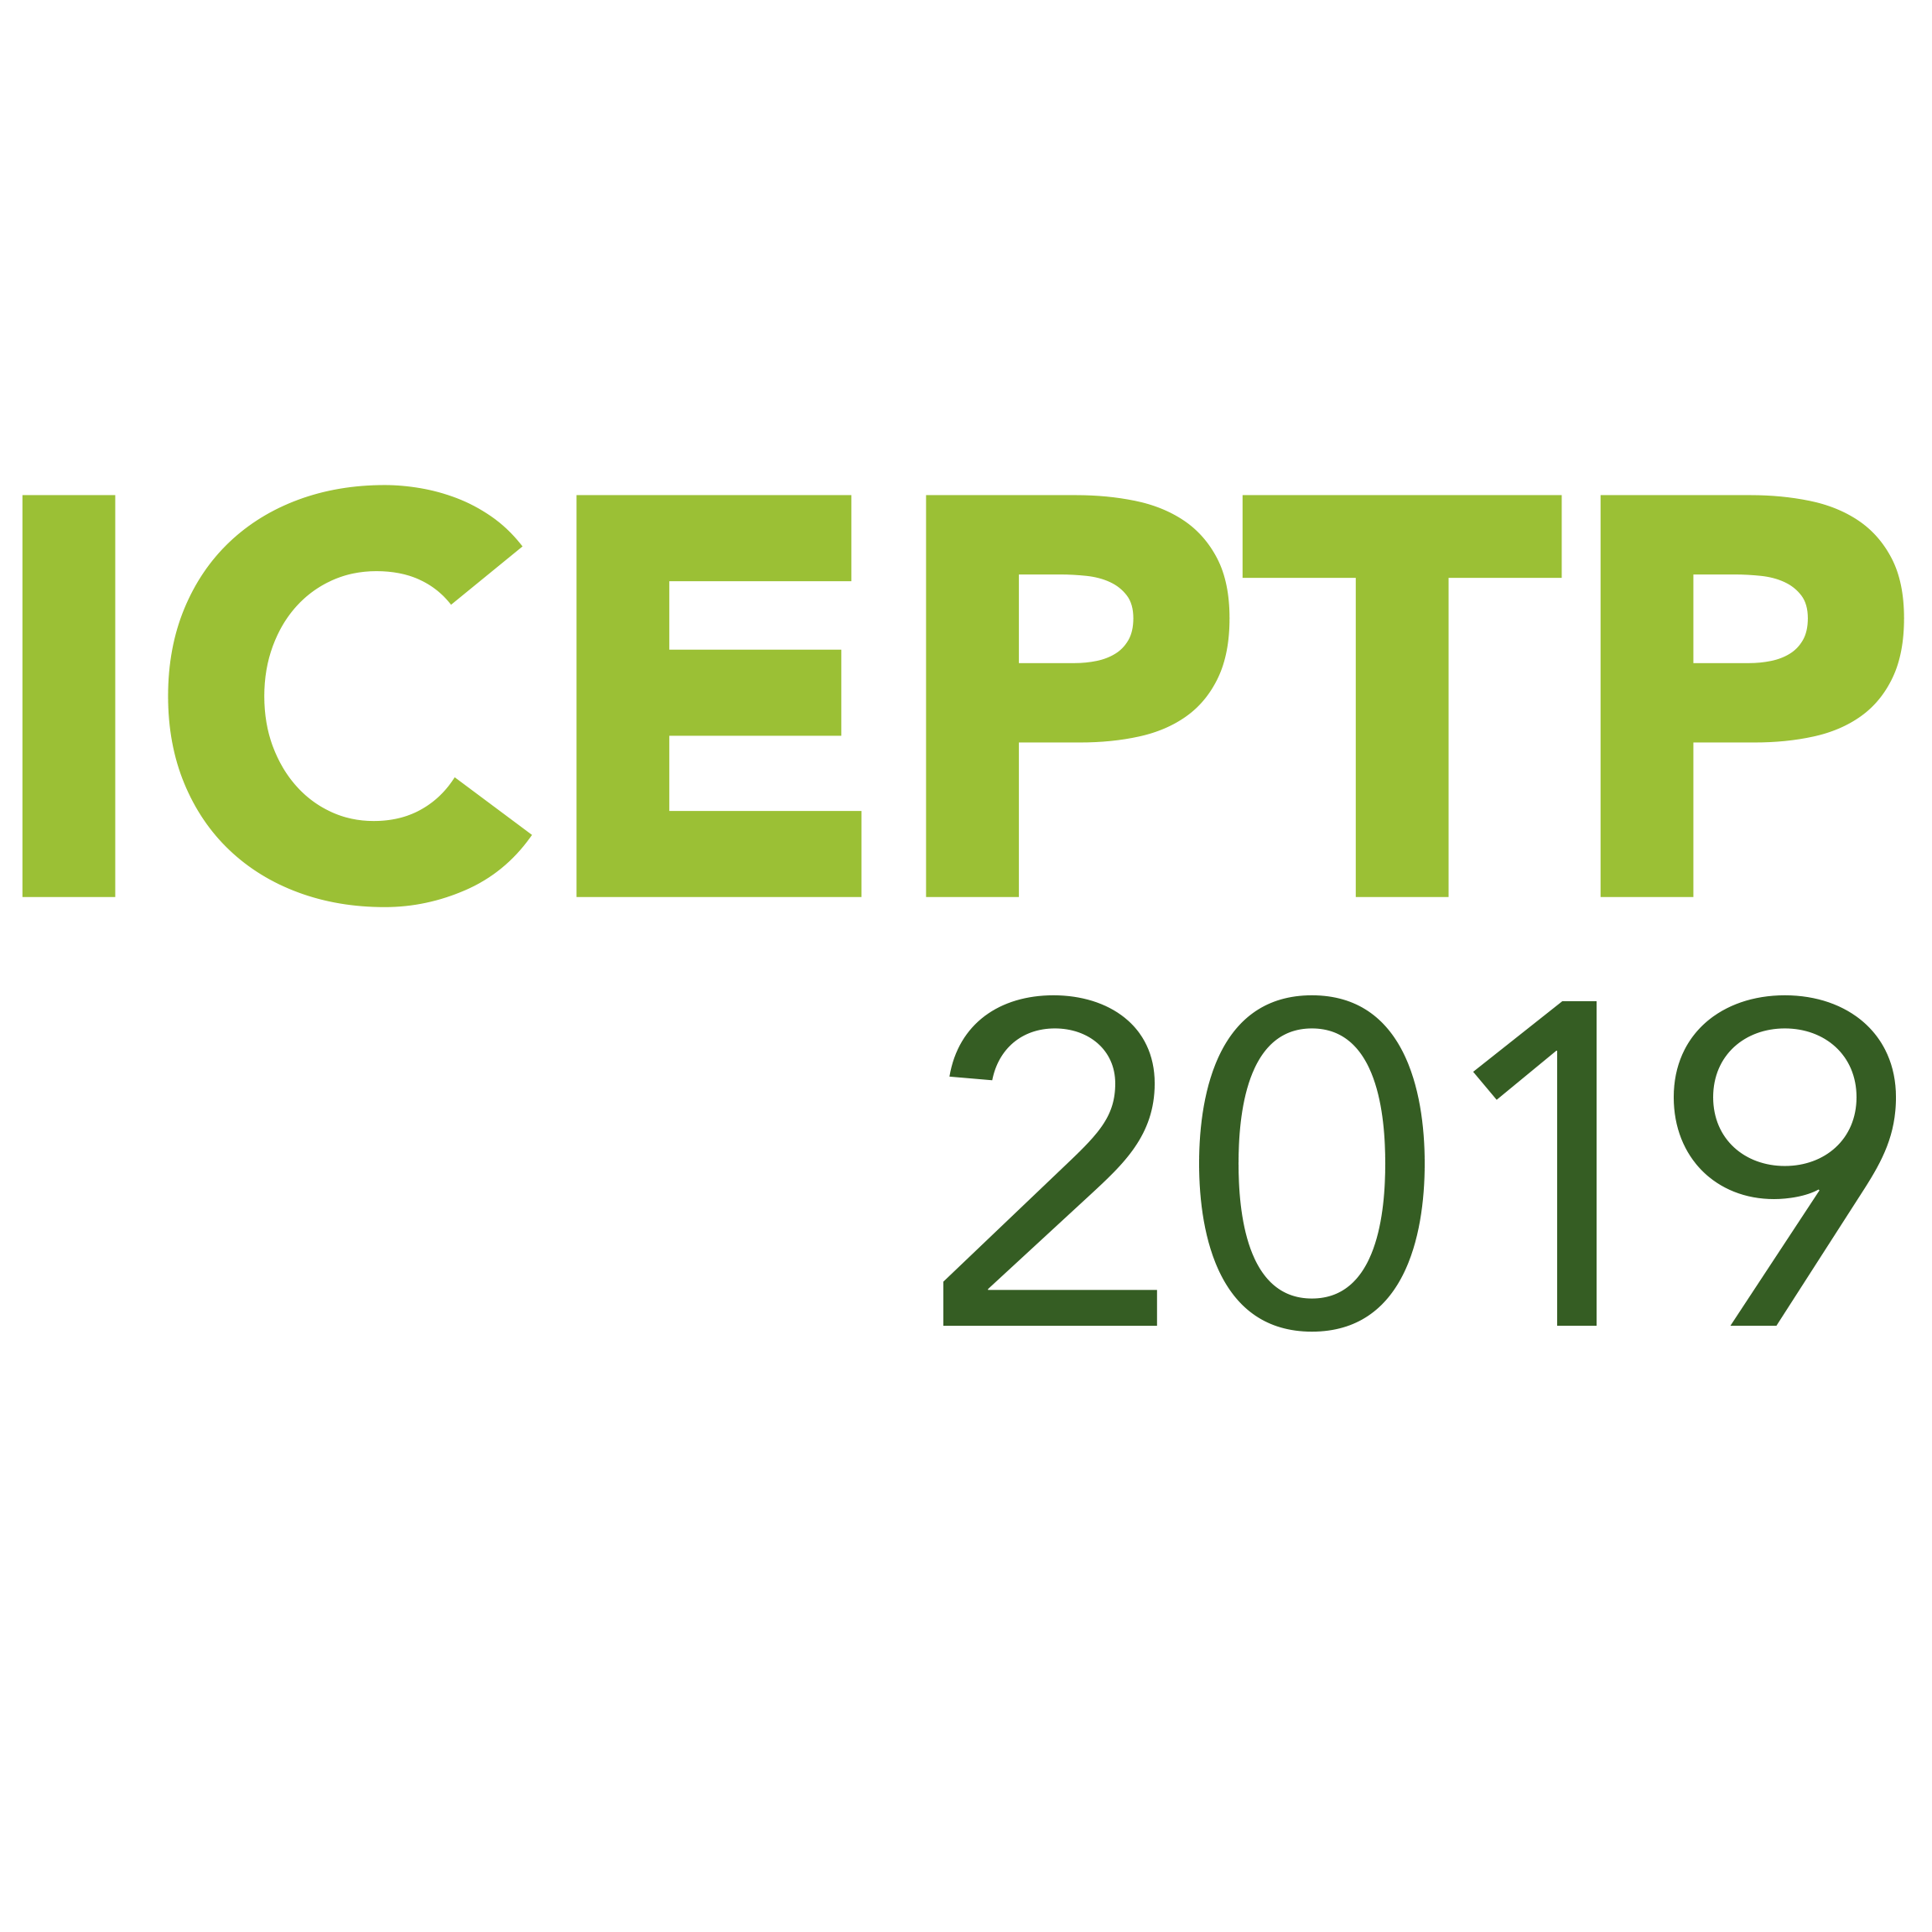 ICEPTP